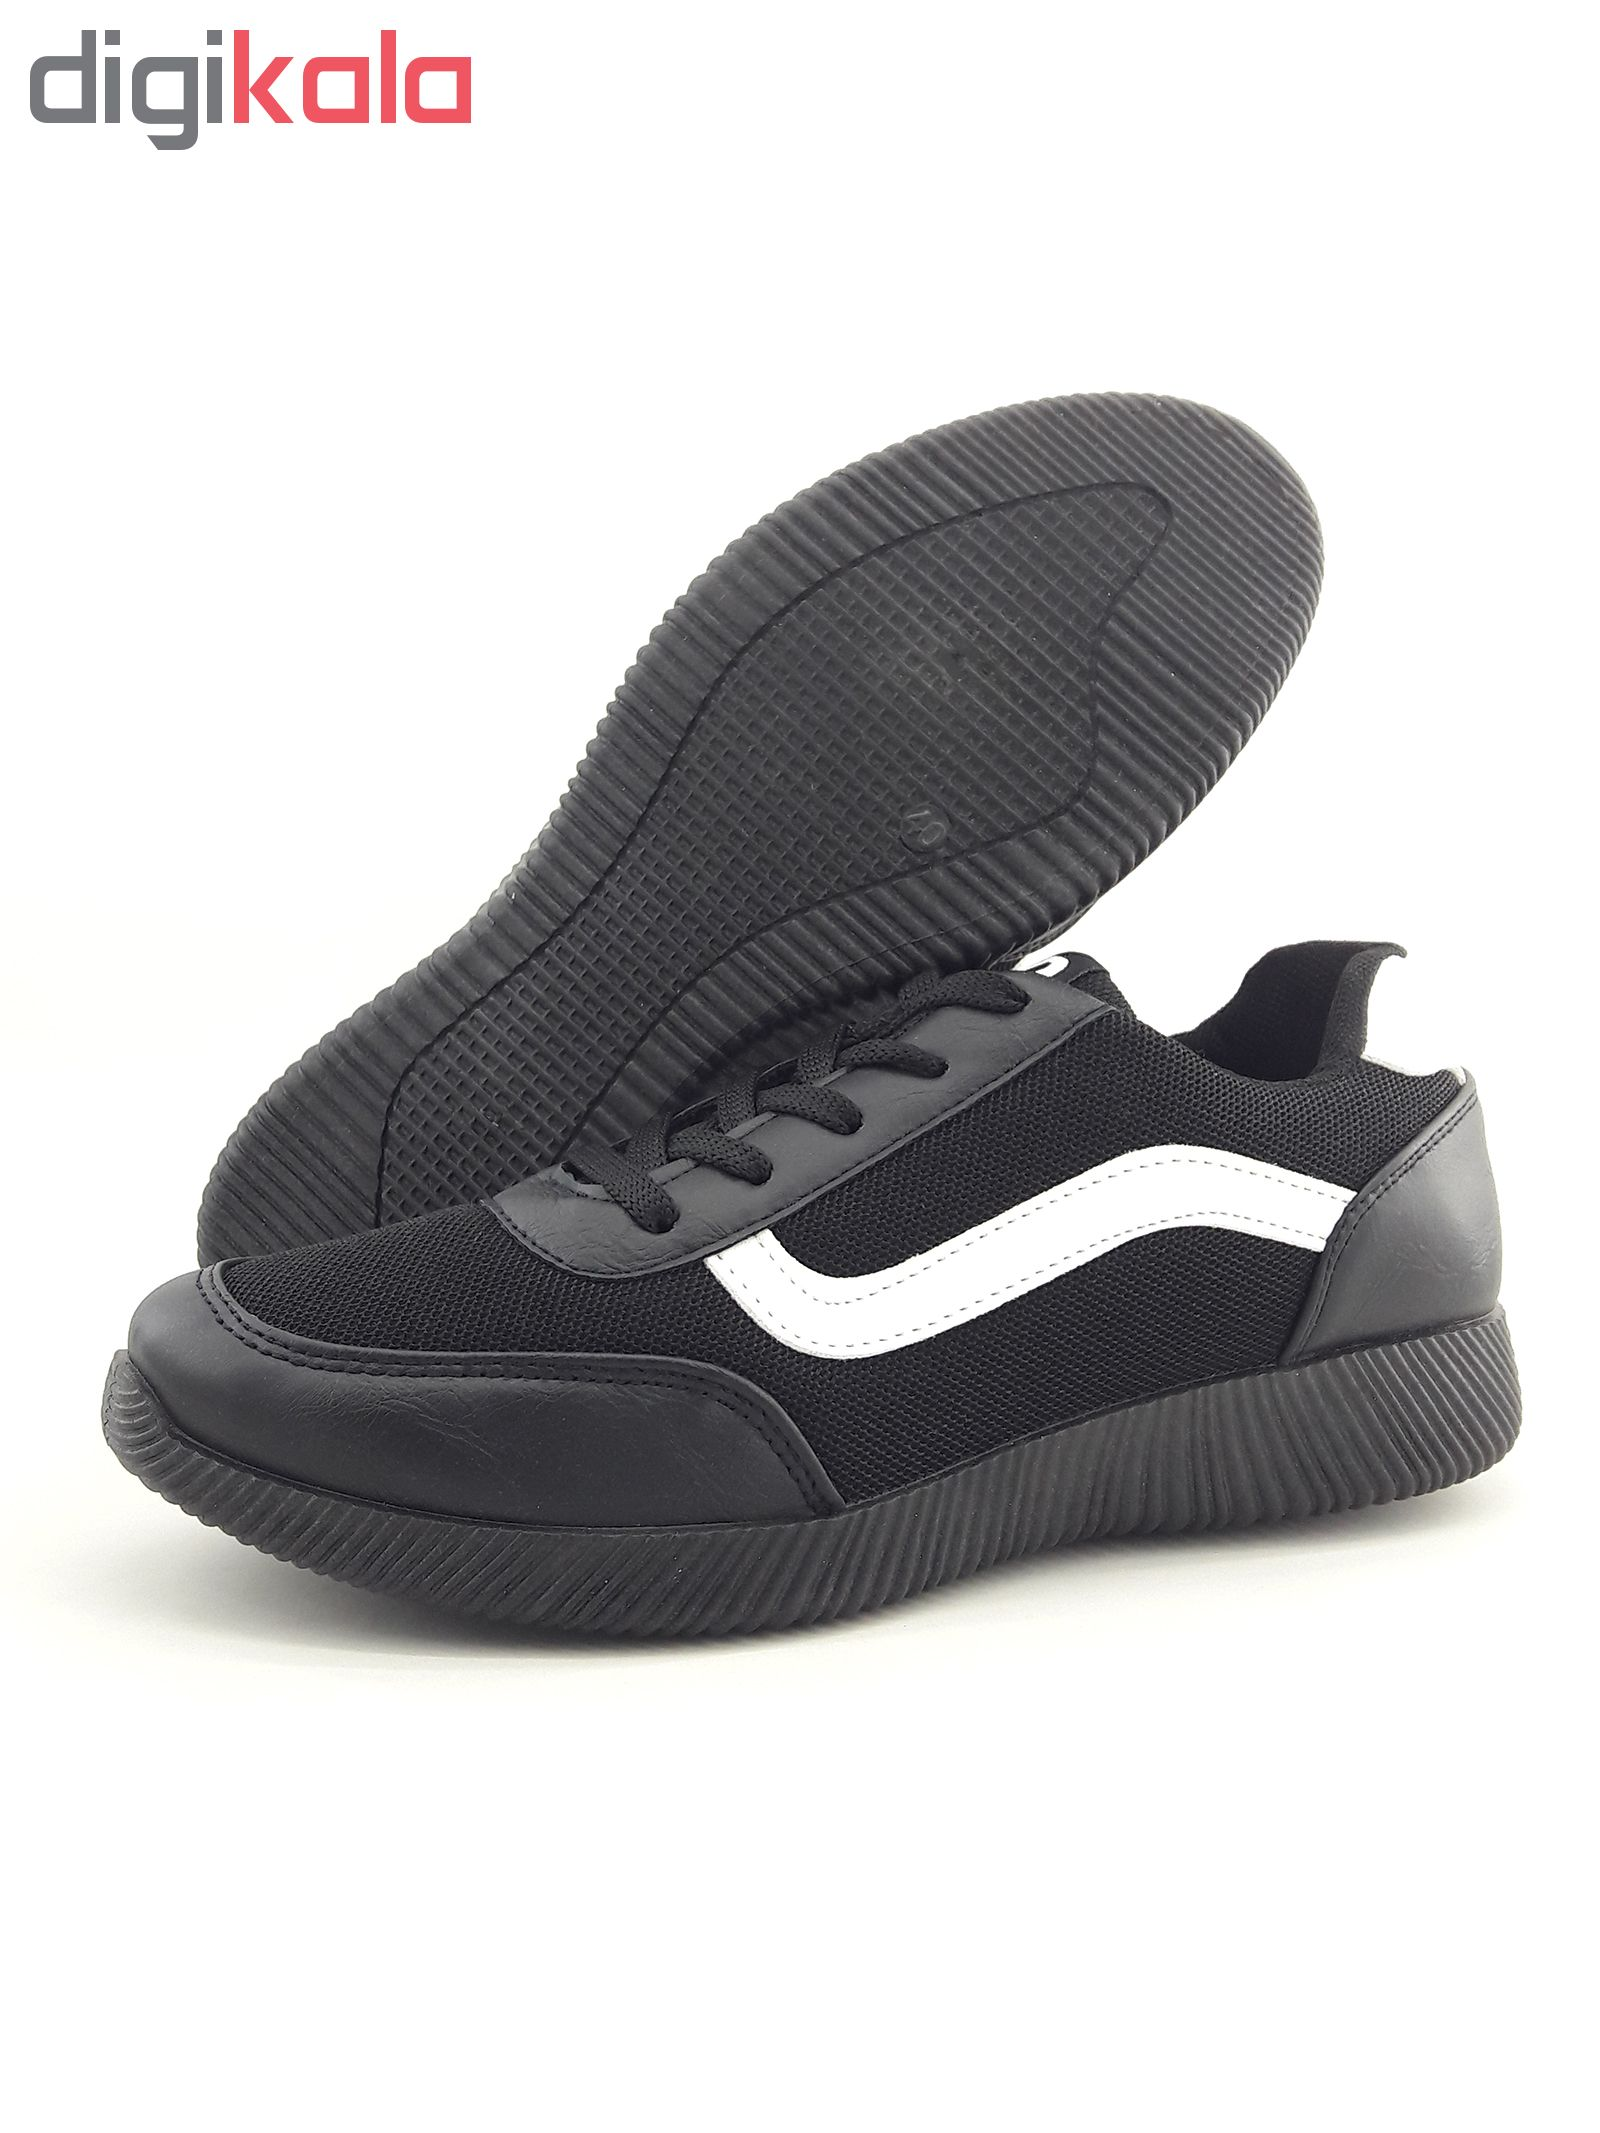 کفش راحتی مردانه ان دی مدل Vnsndblwh-01